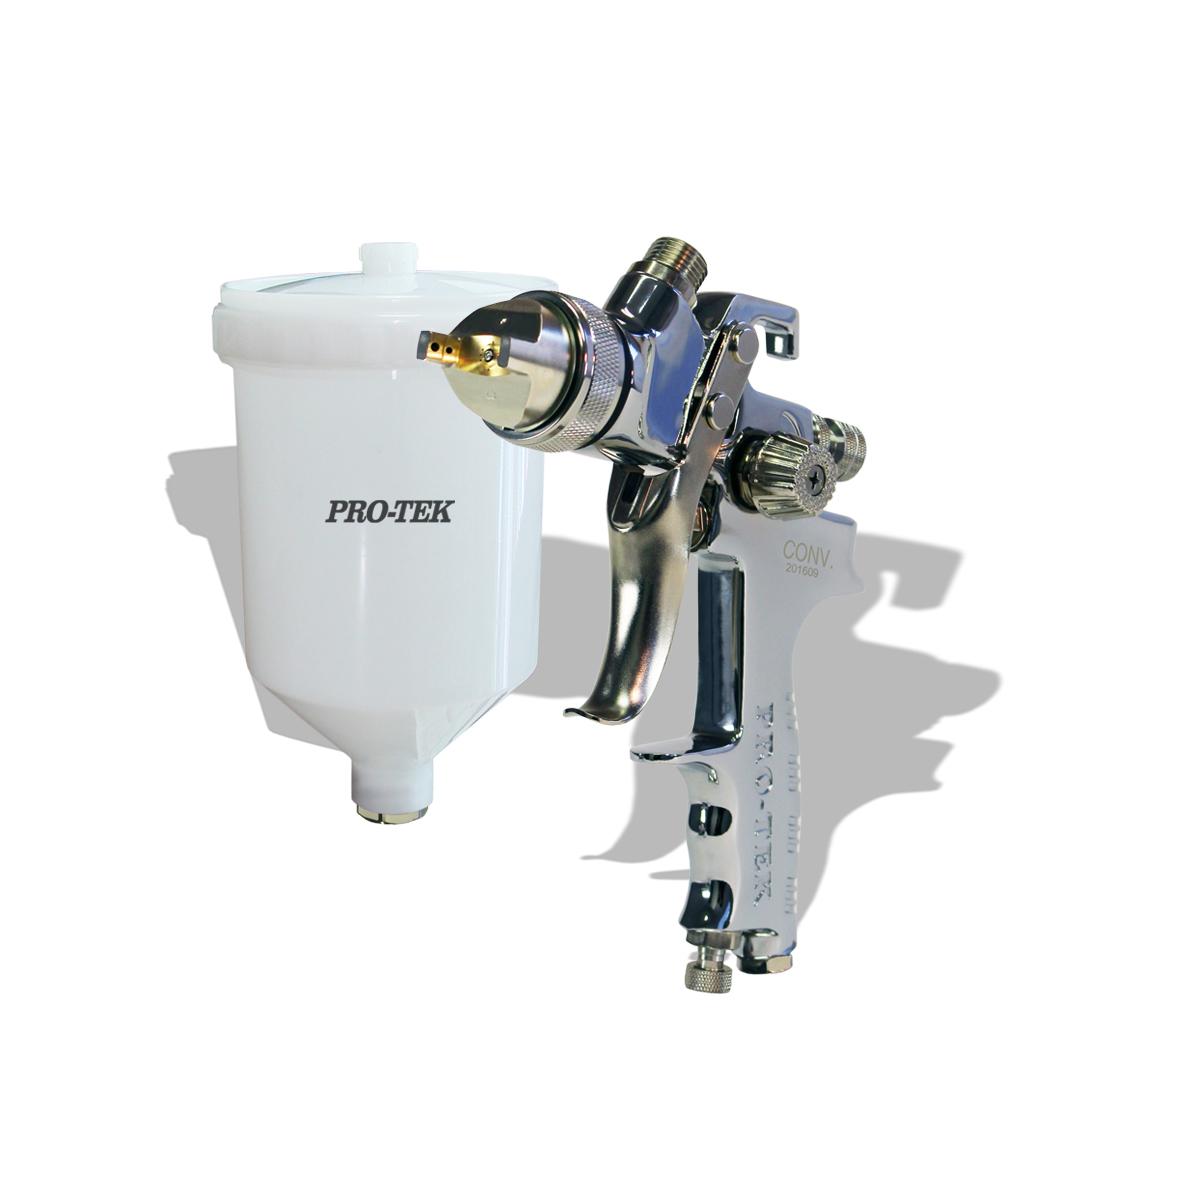 Pro Tek 2600 Gravity Spray Gun